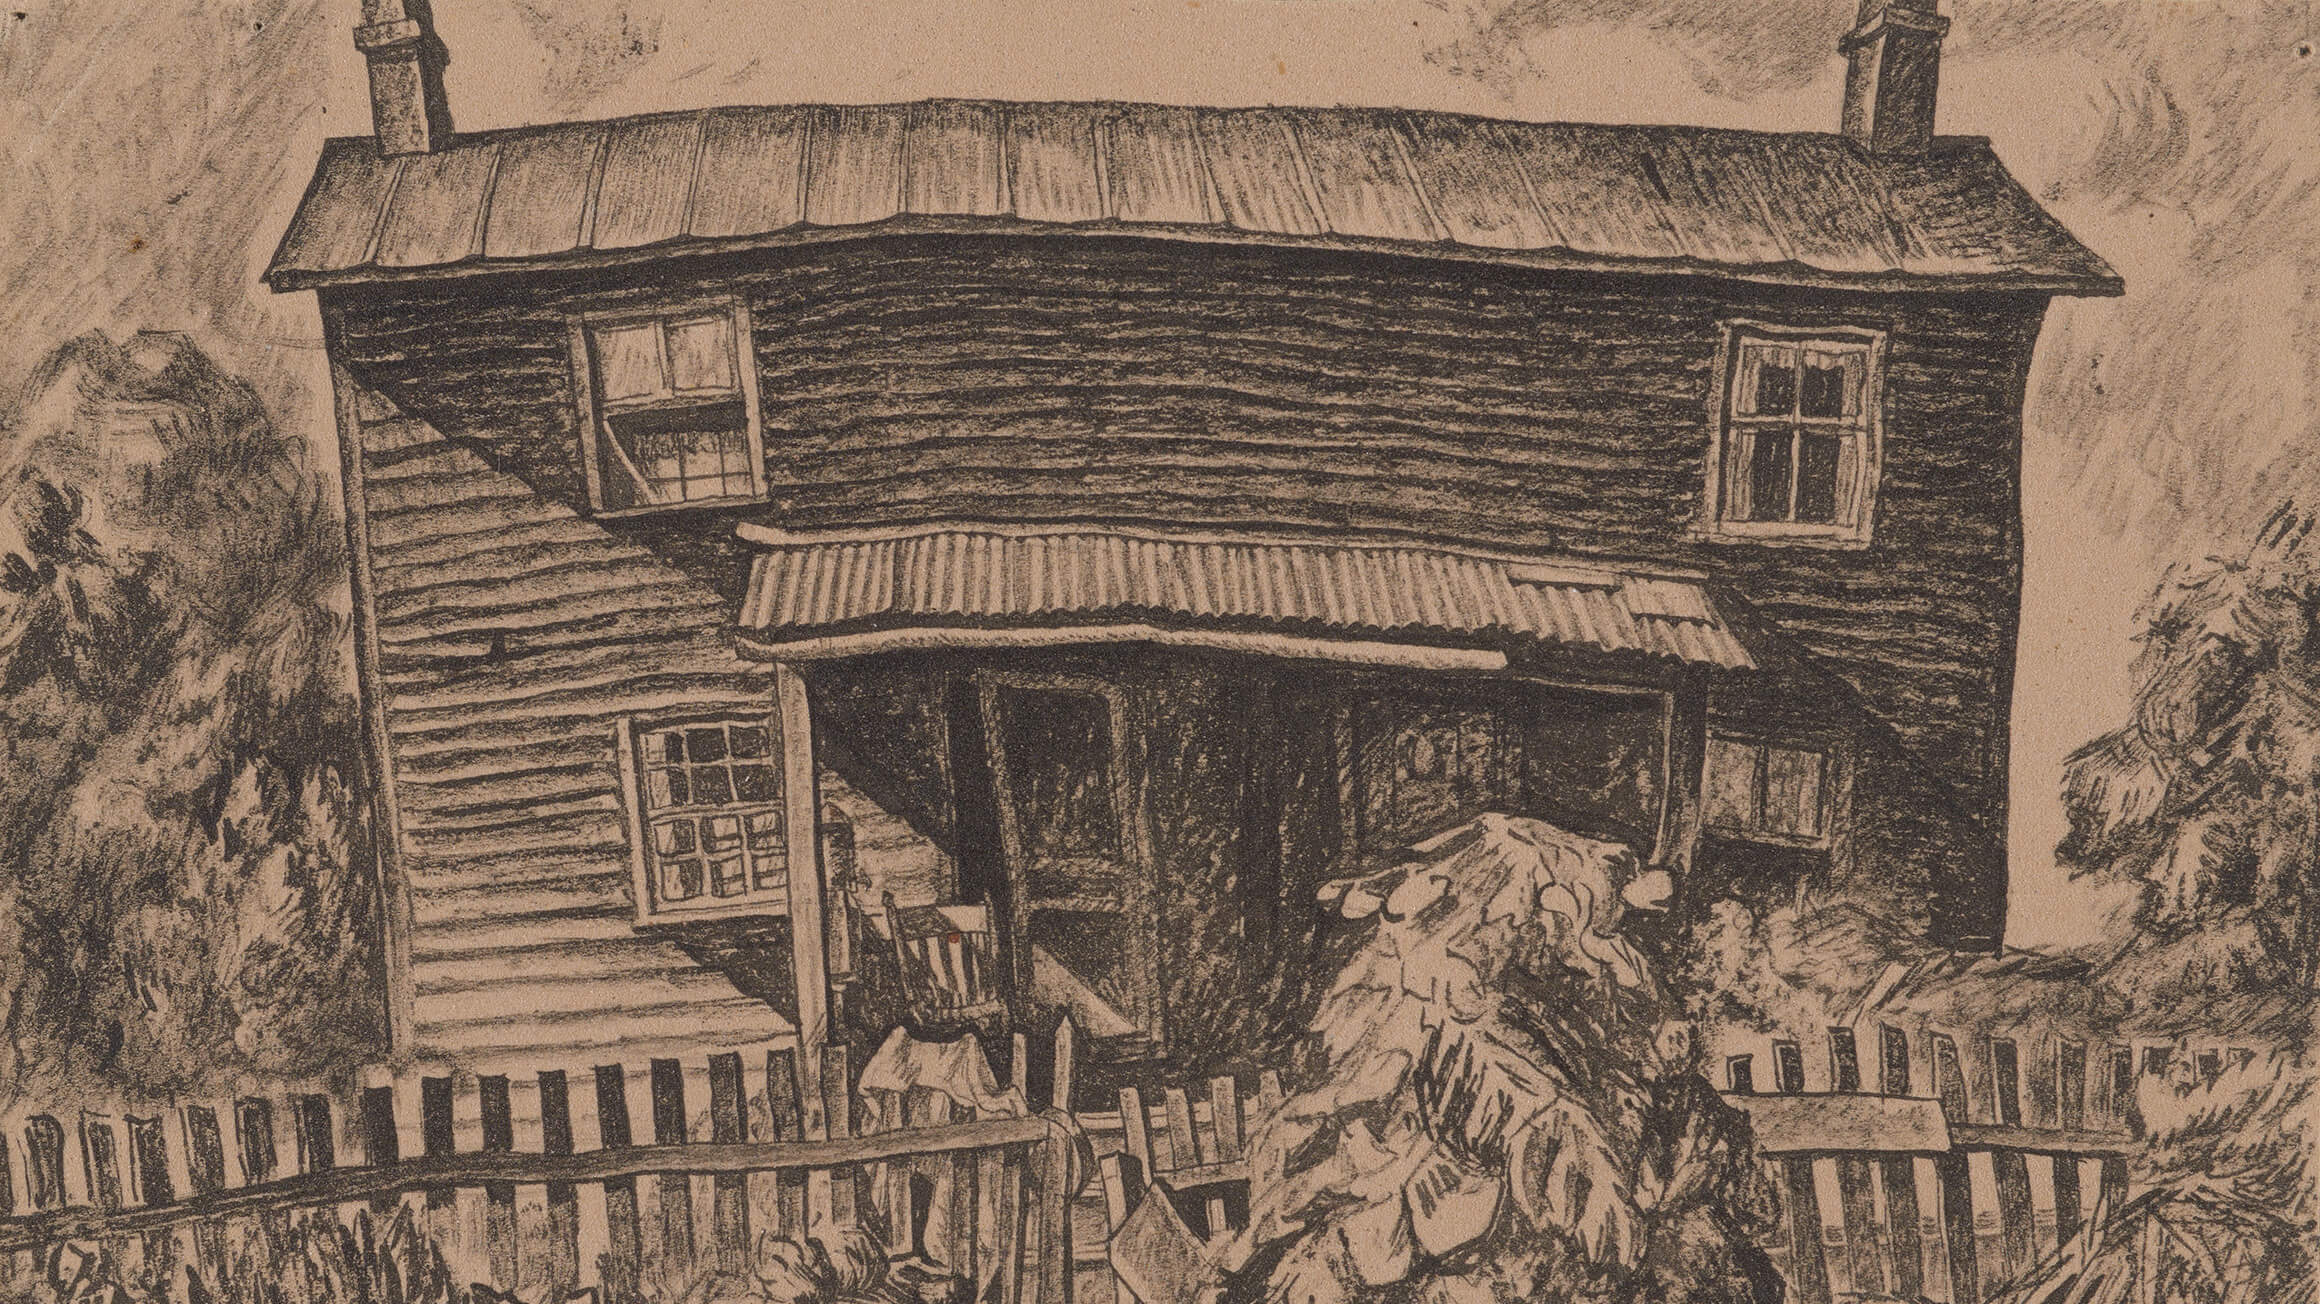 Tumble Timbers (study drawing) (detail), c. 1925–26, by Wanda Gág